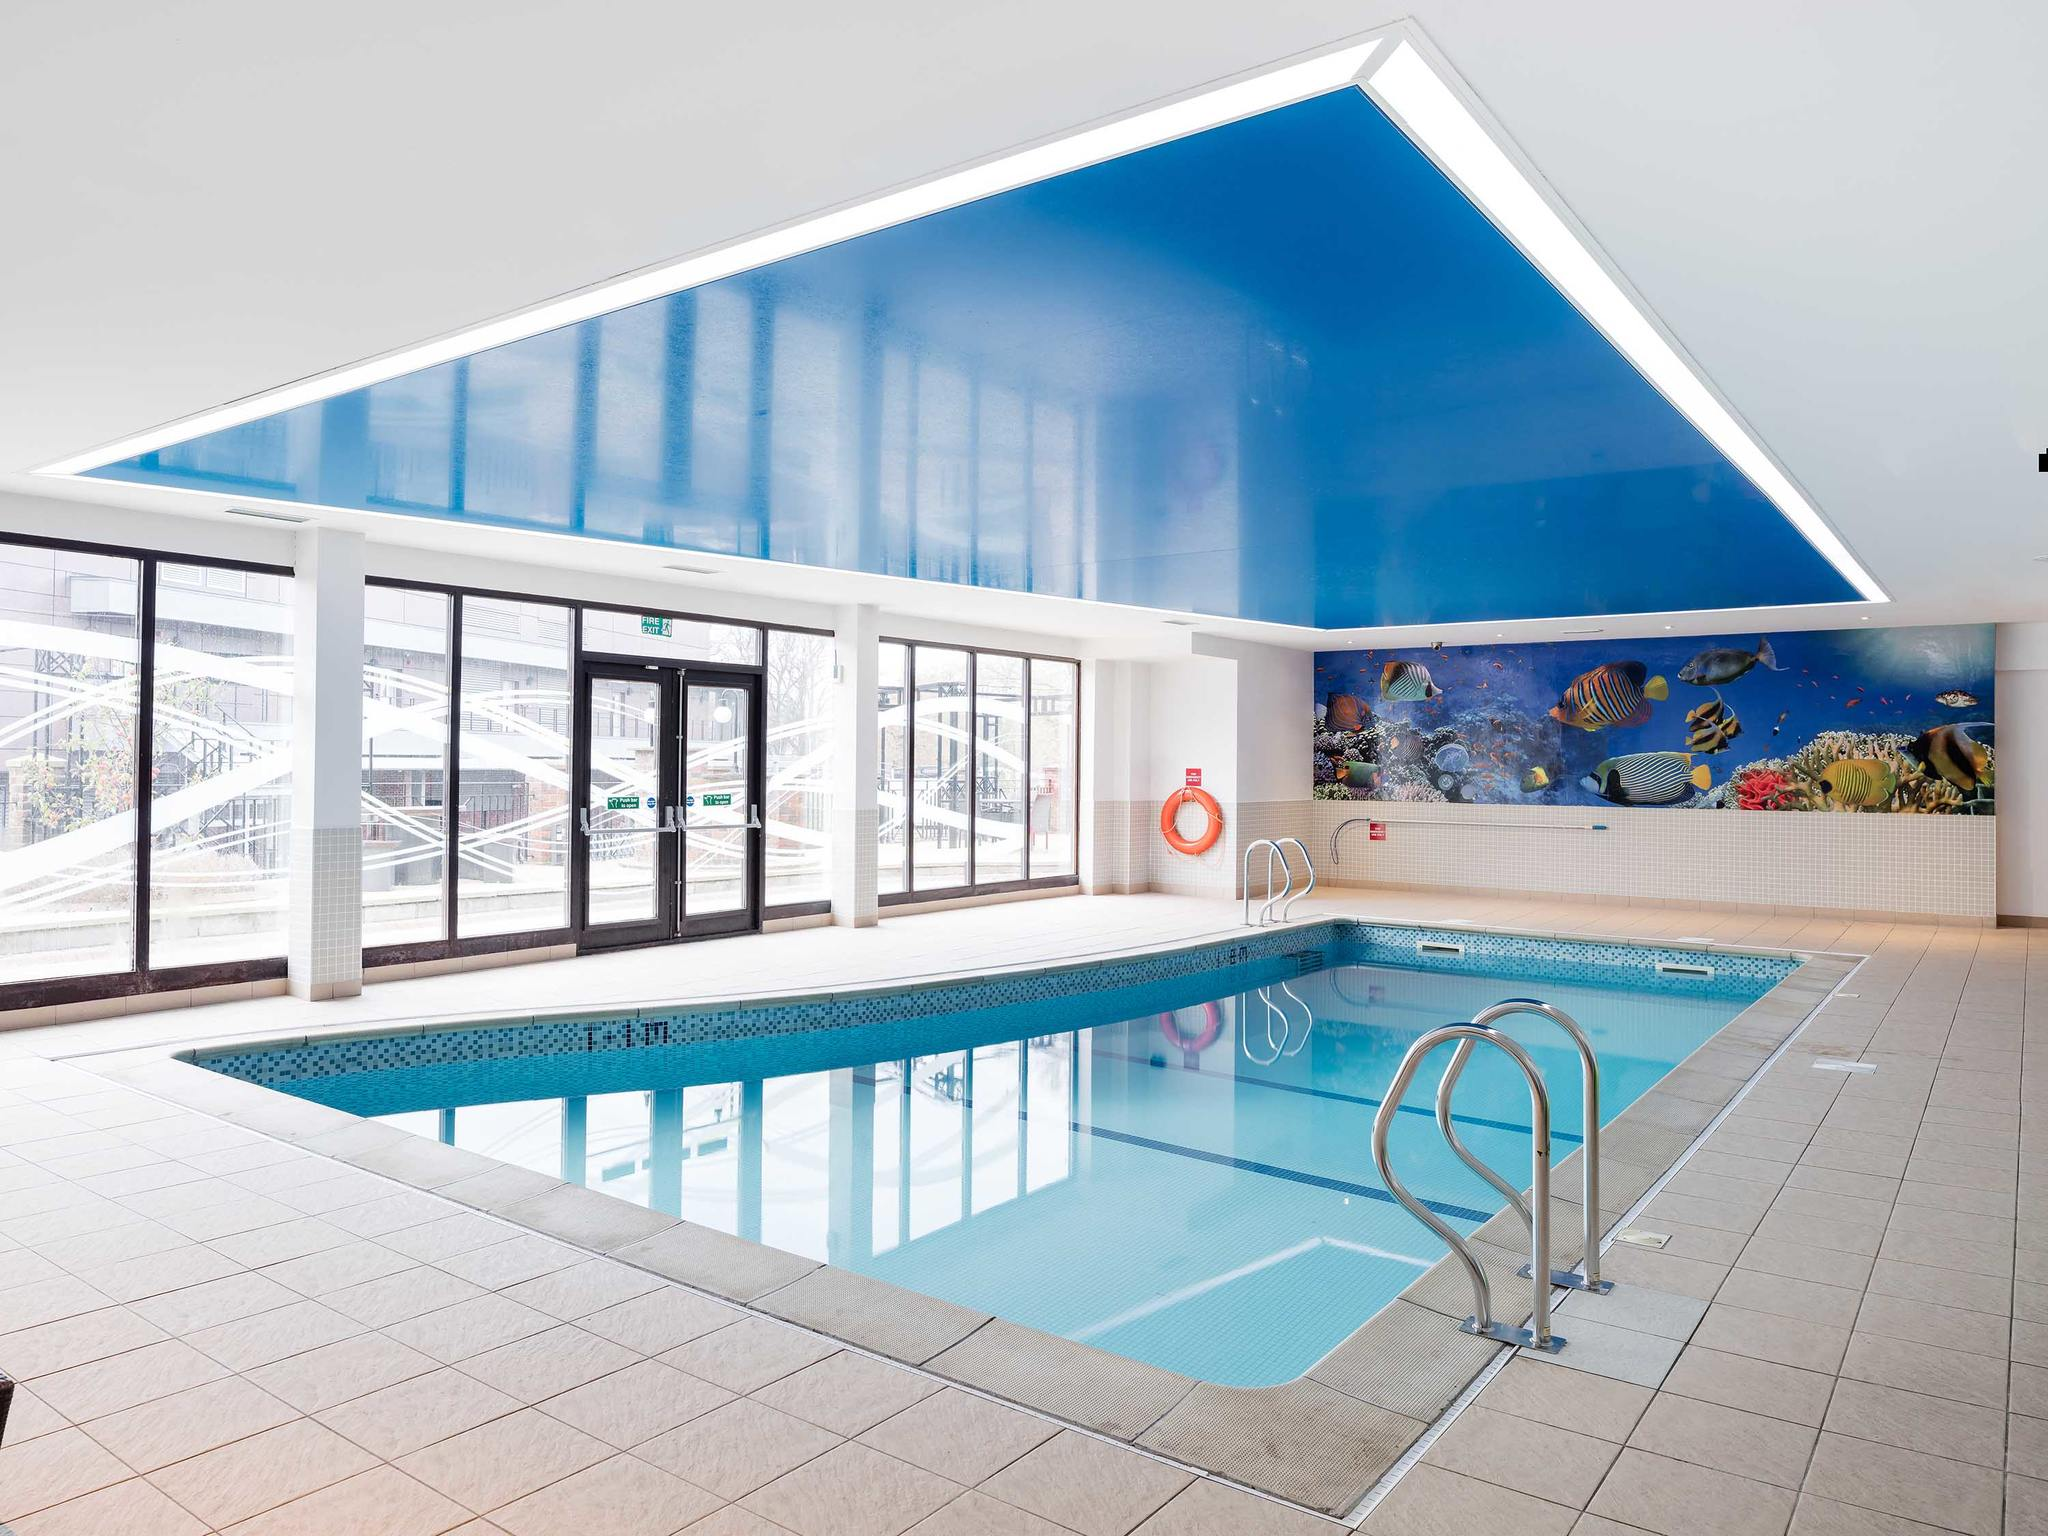 novotel york centre relaxing spacious hotel in york